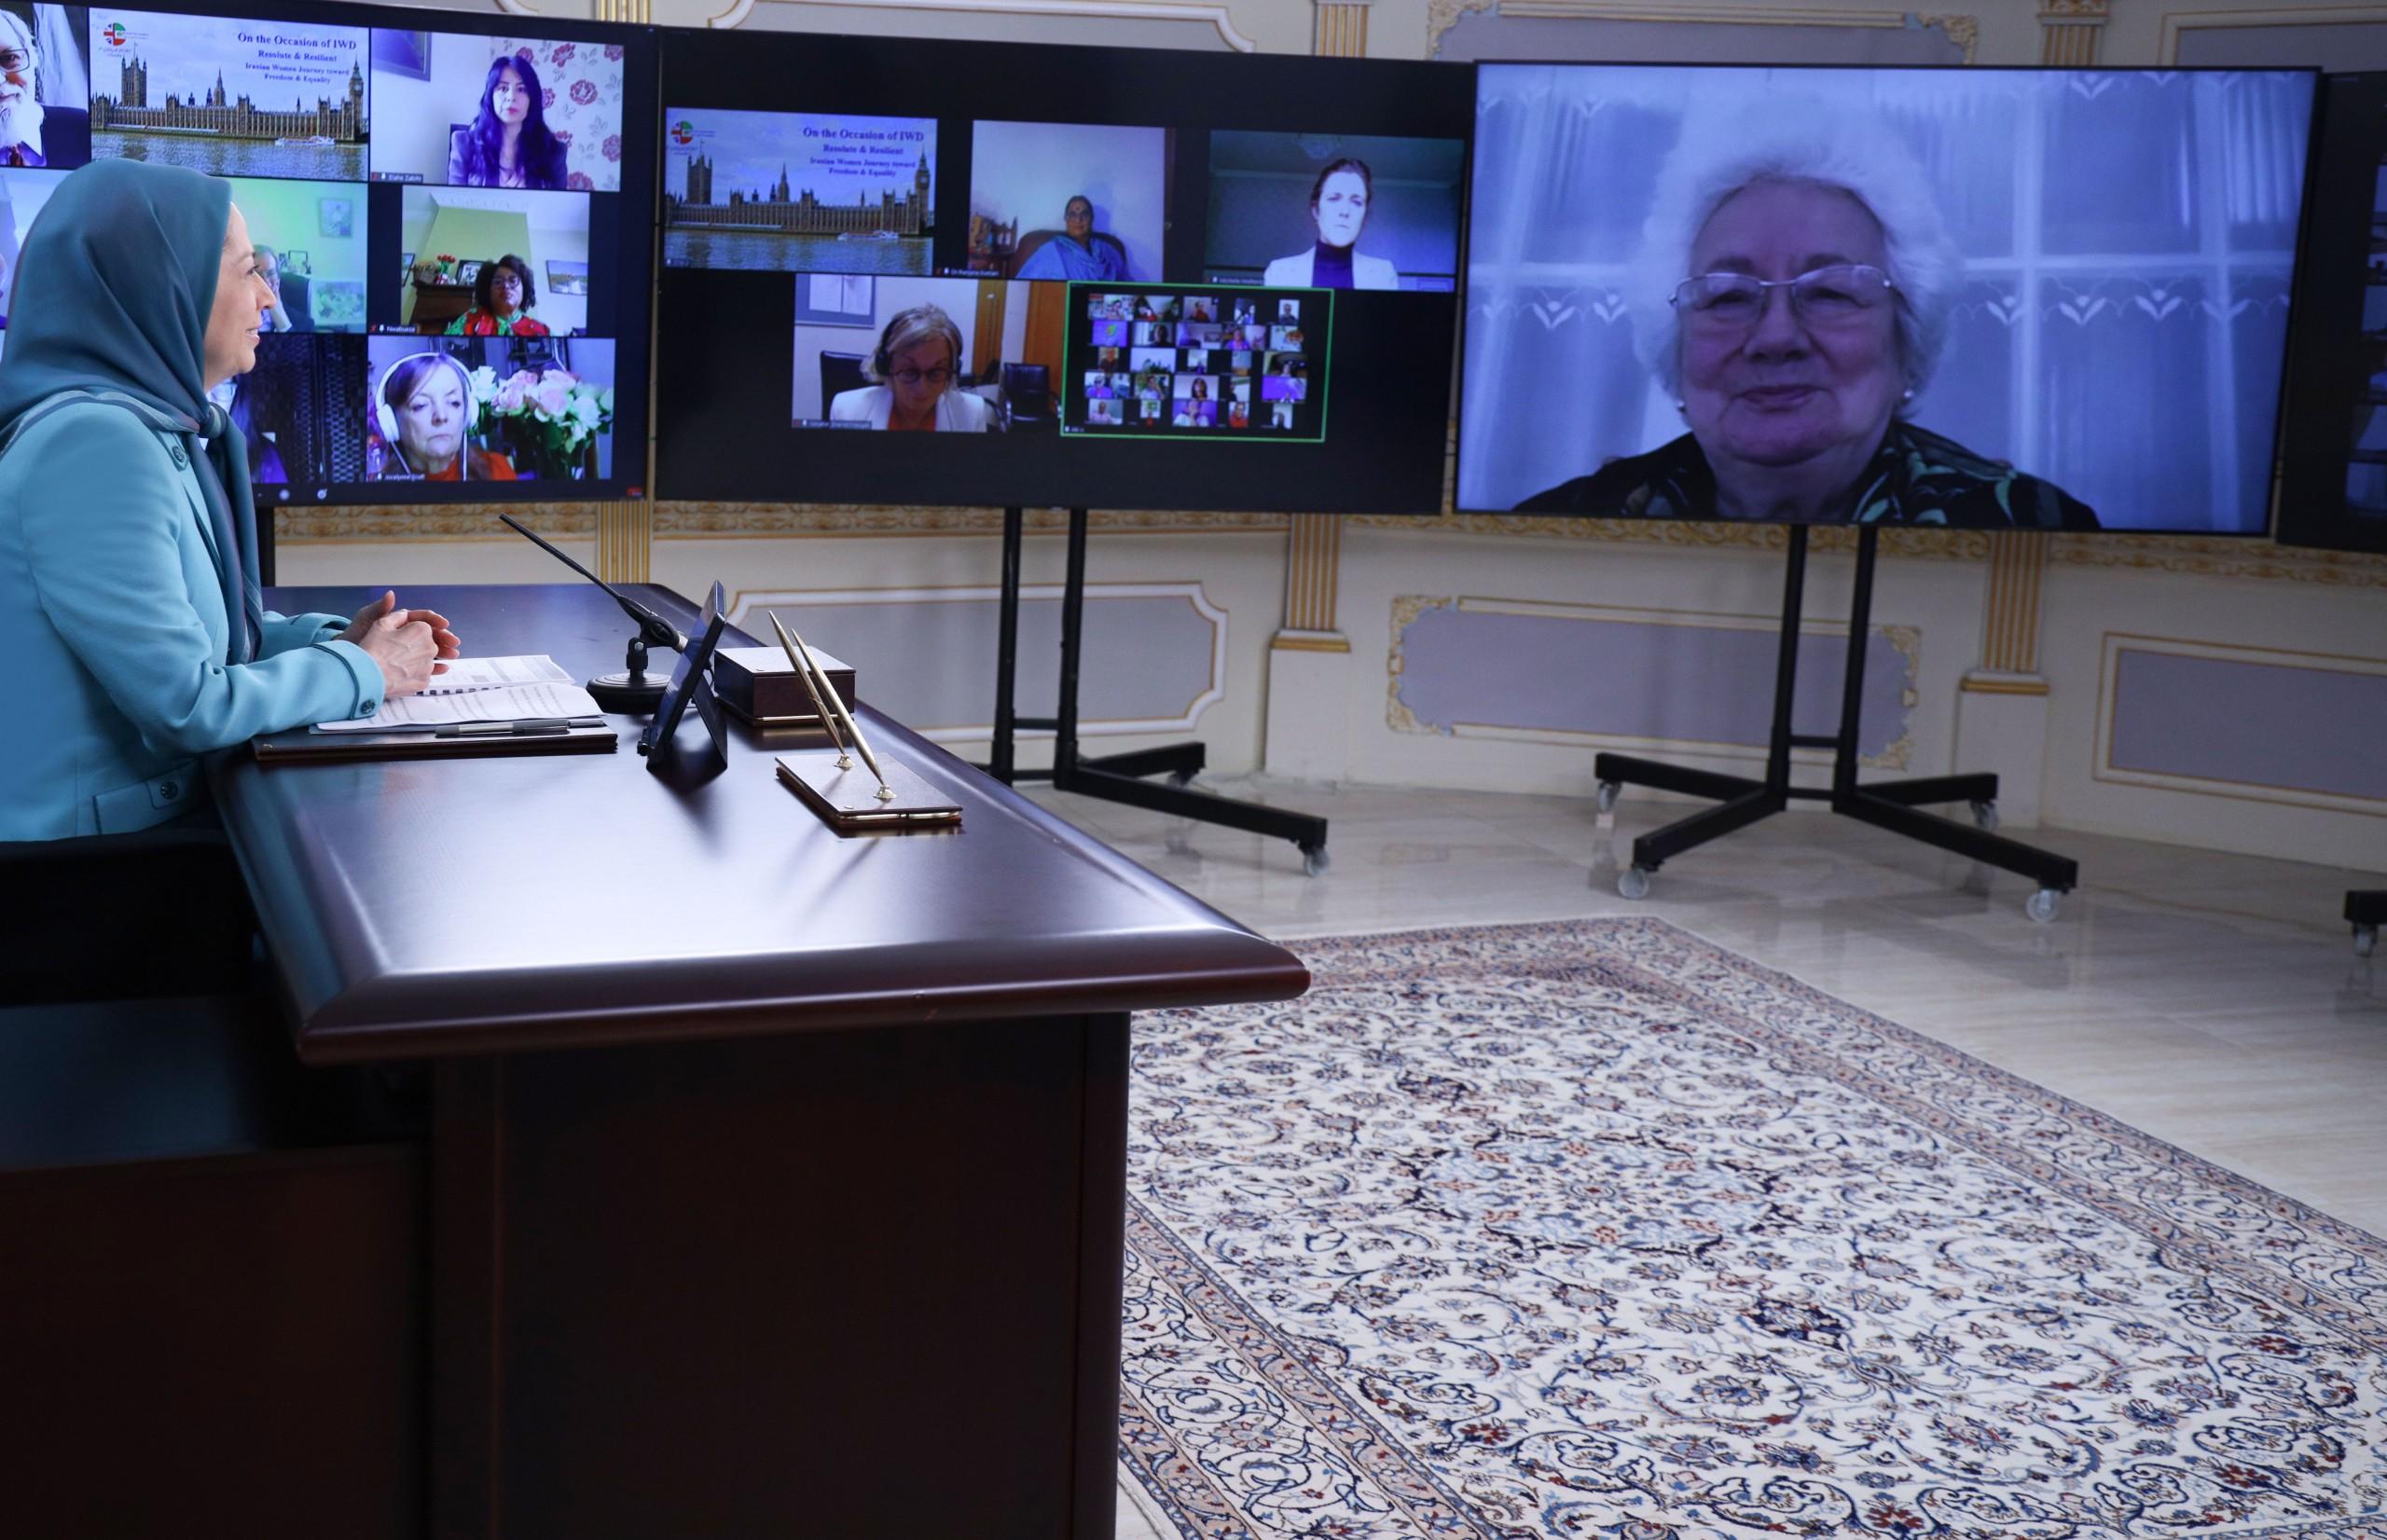 Maryam Rajavi: I urge all advocates of gender equality to support the arisen women of Iran